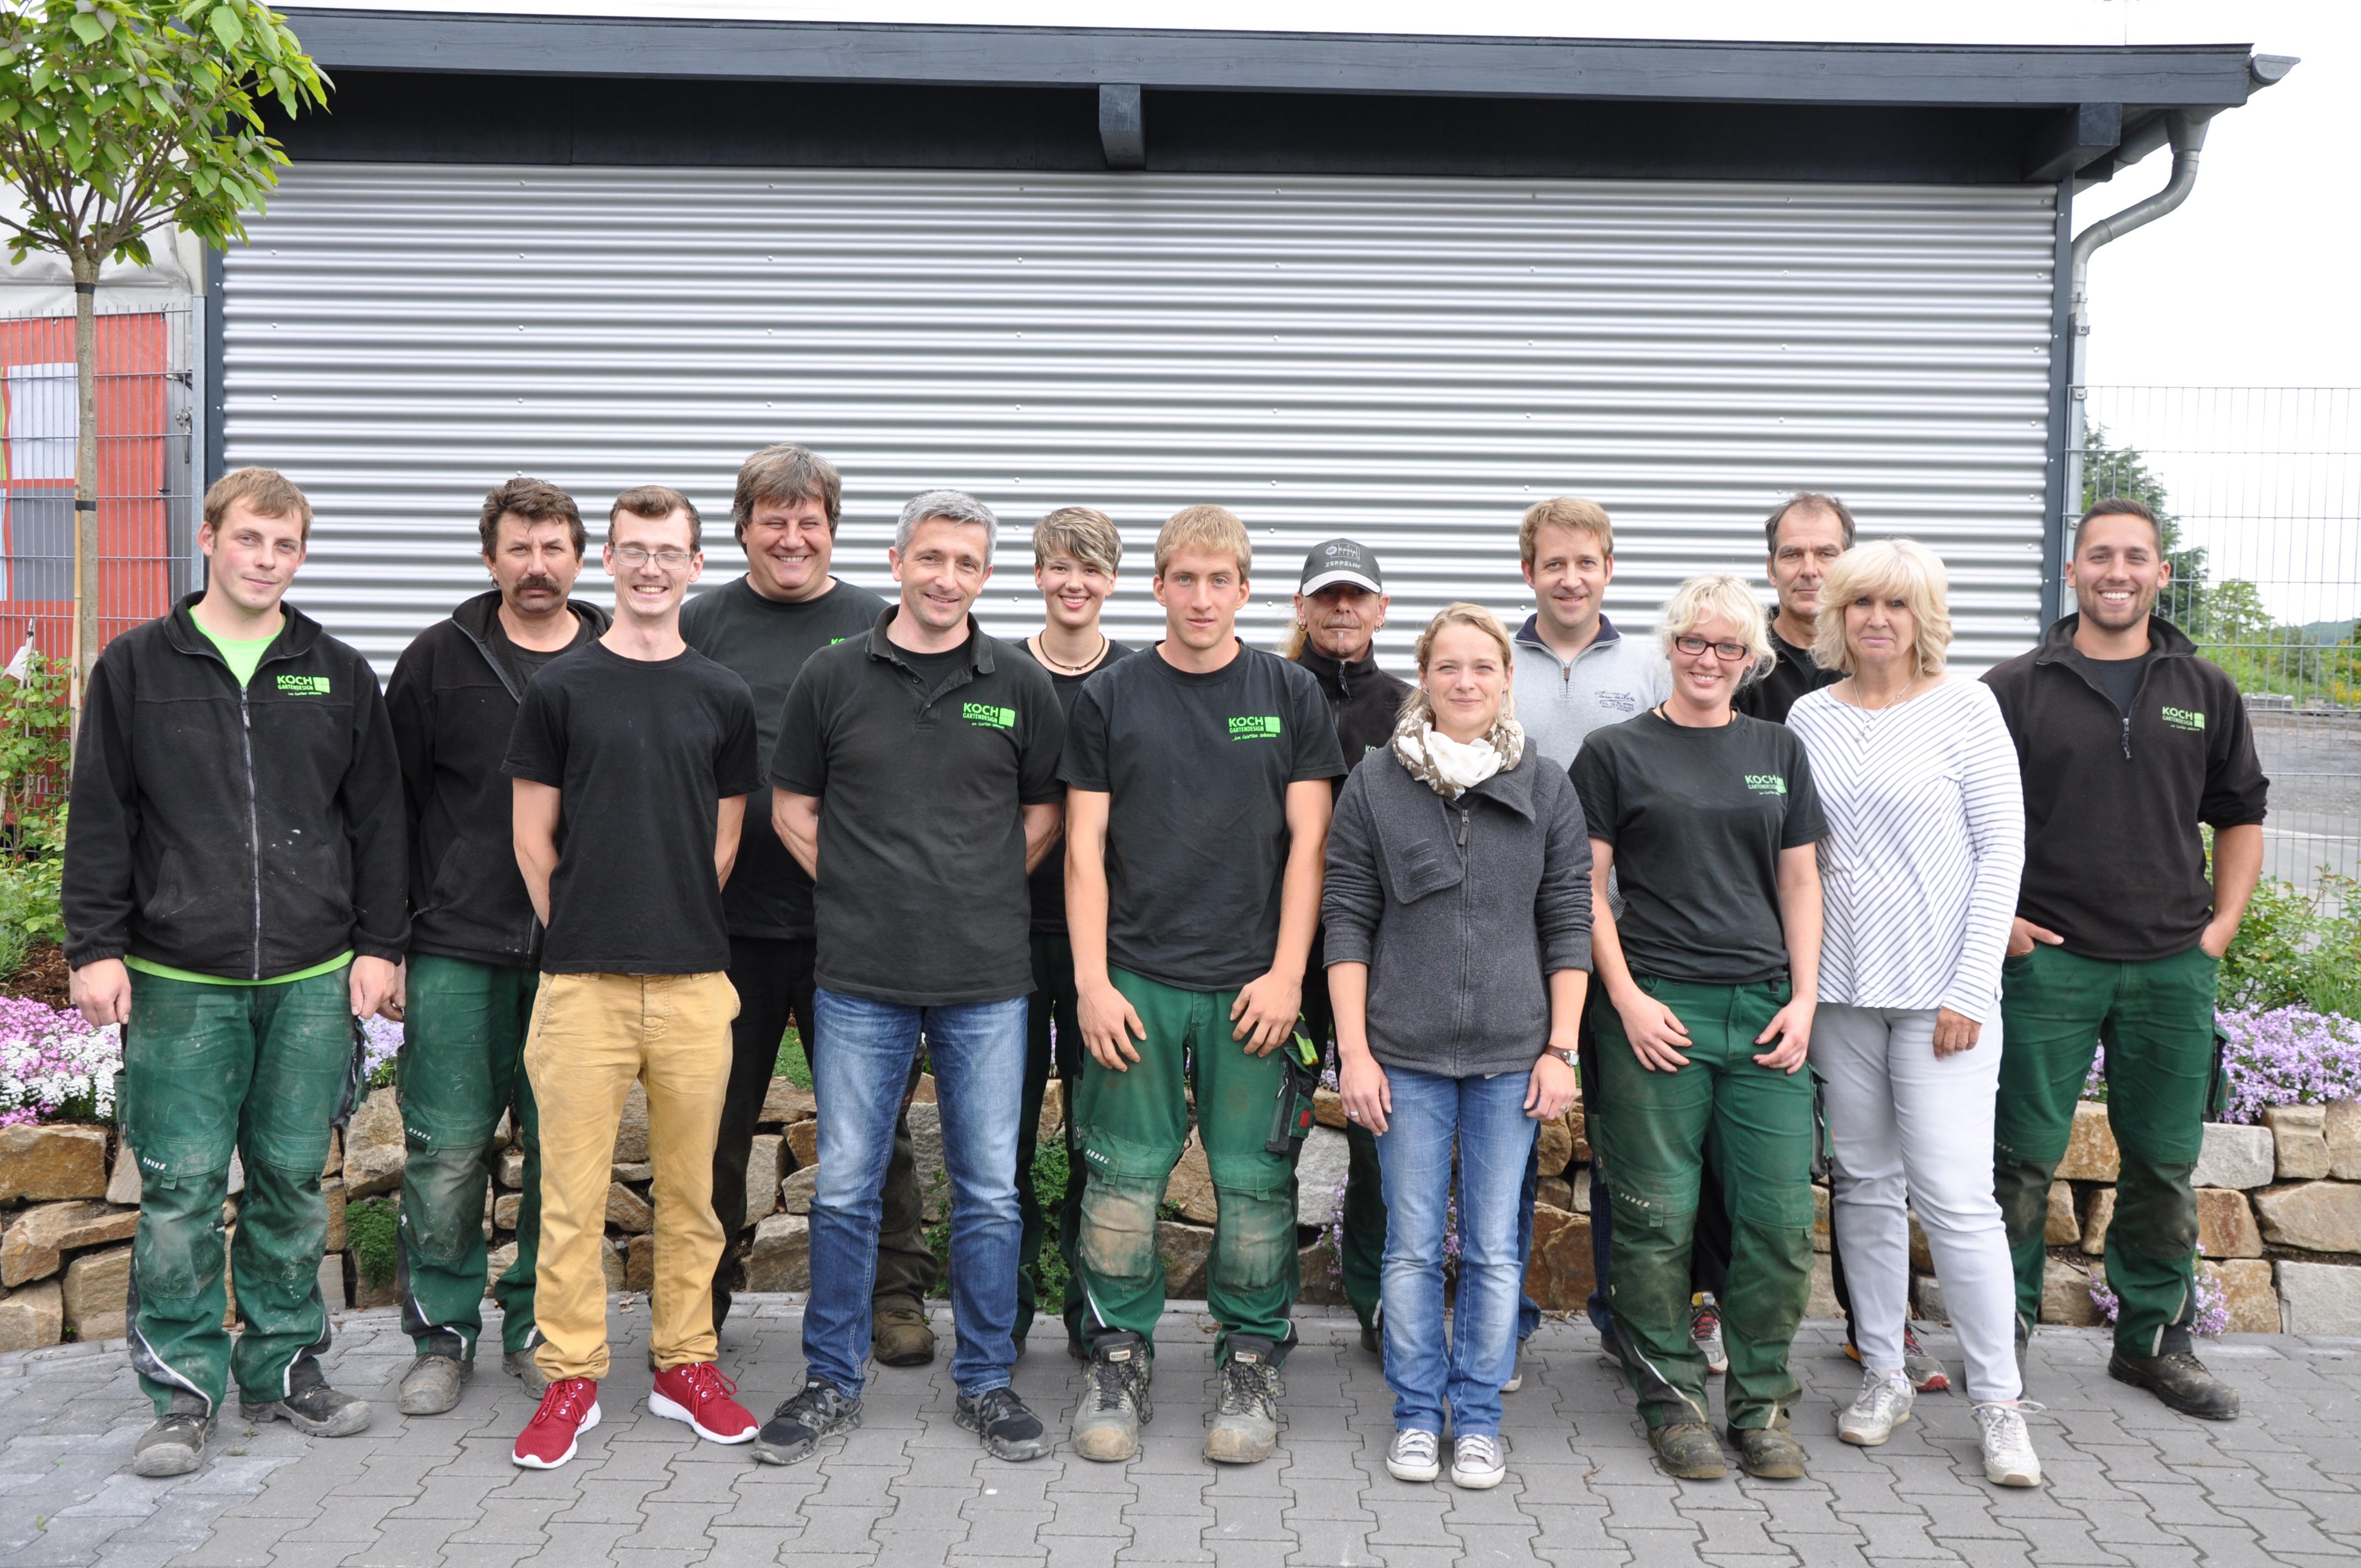 2016-05-24 Team-Koch-Gartendesign-GmbH